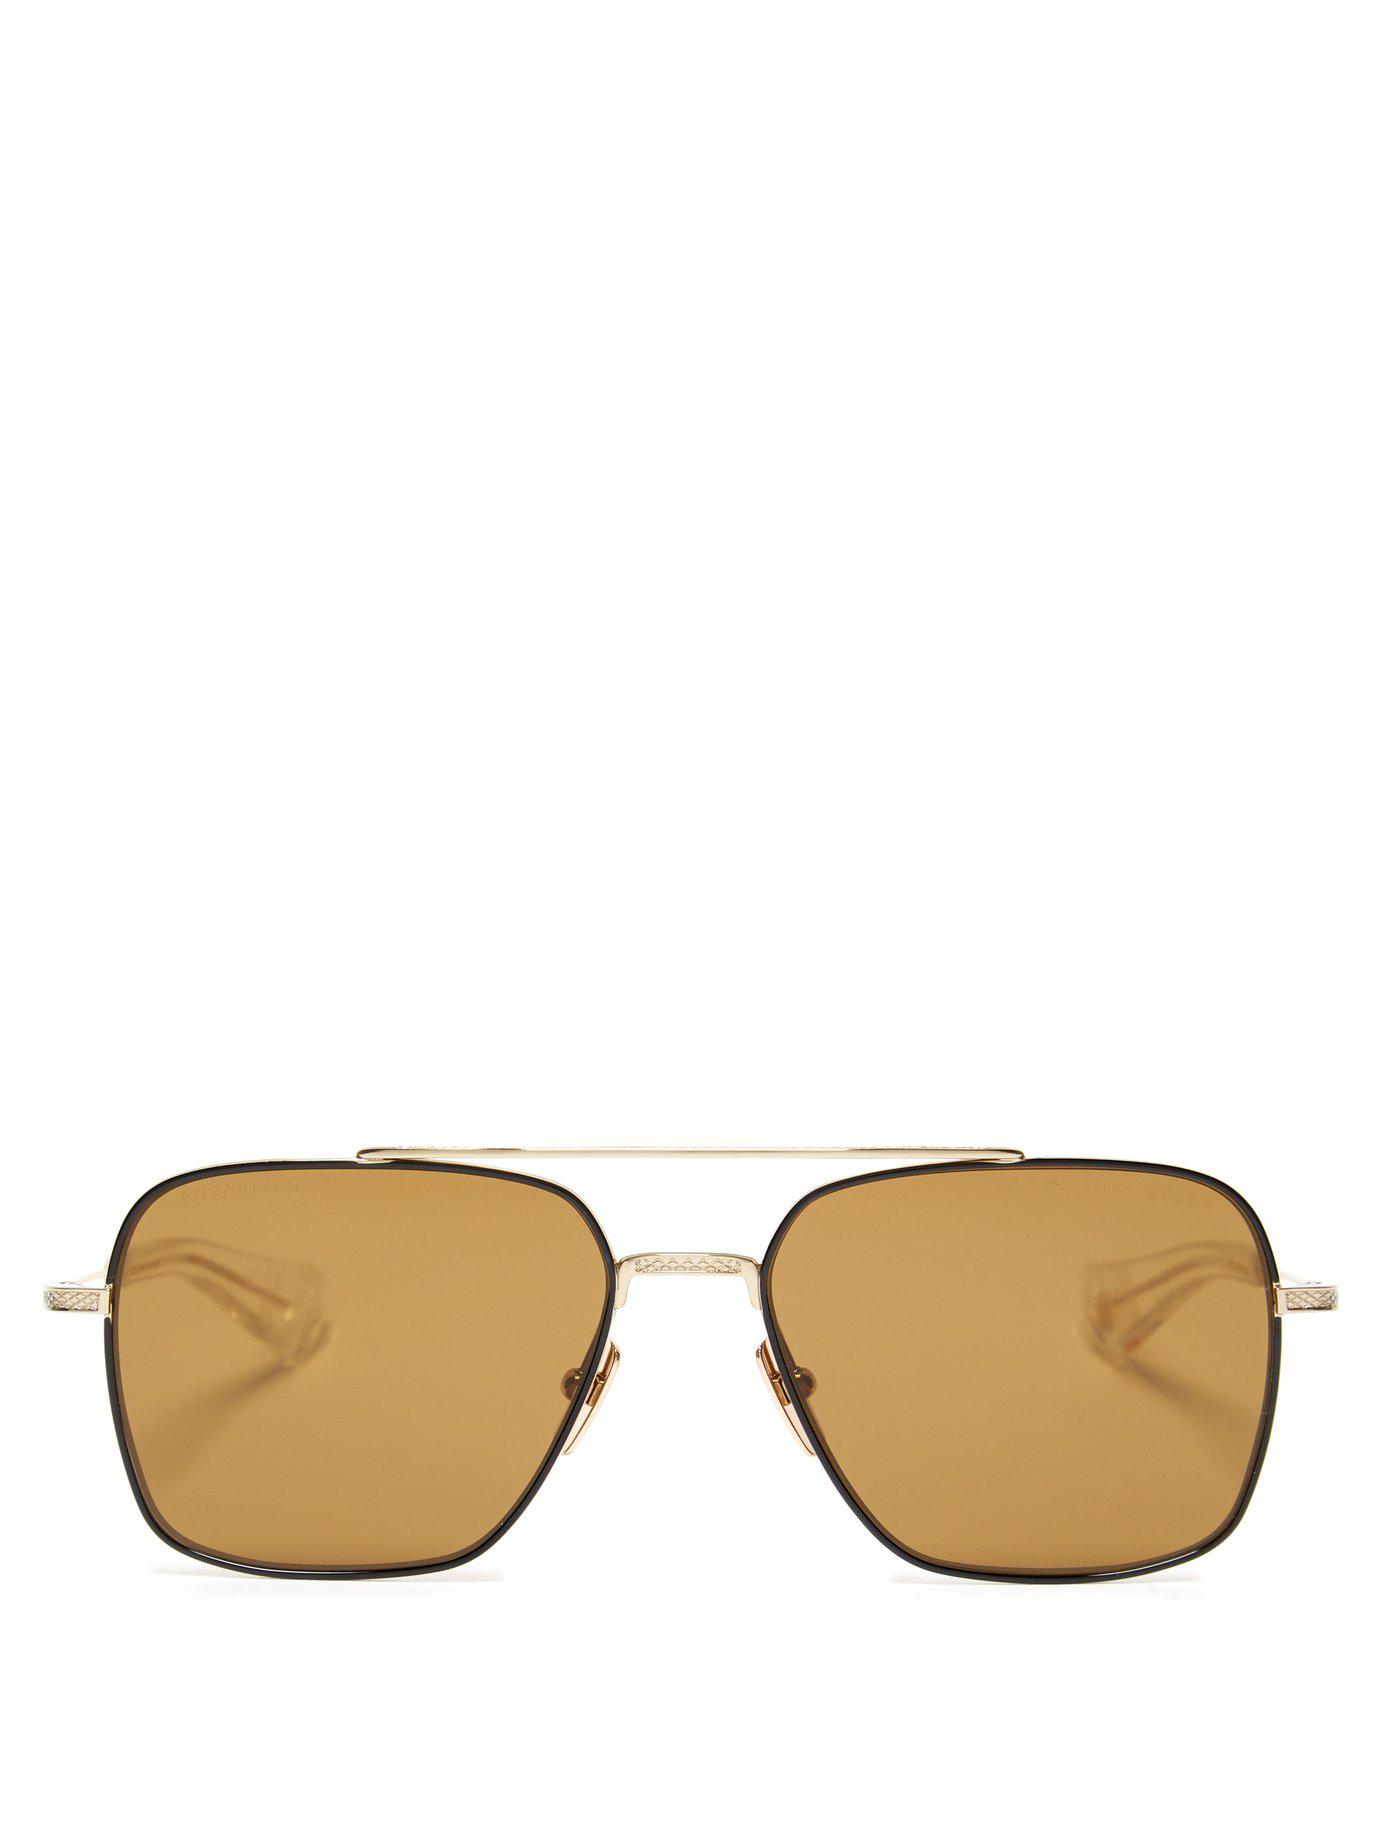 970865046fb8 Lyst - Dita Eyewear Flight Seven Titanium And Acetate Sunglasses in ...